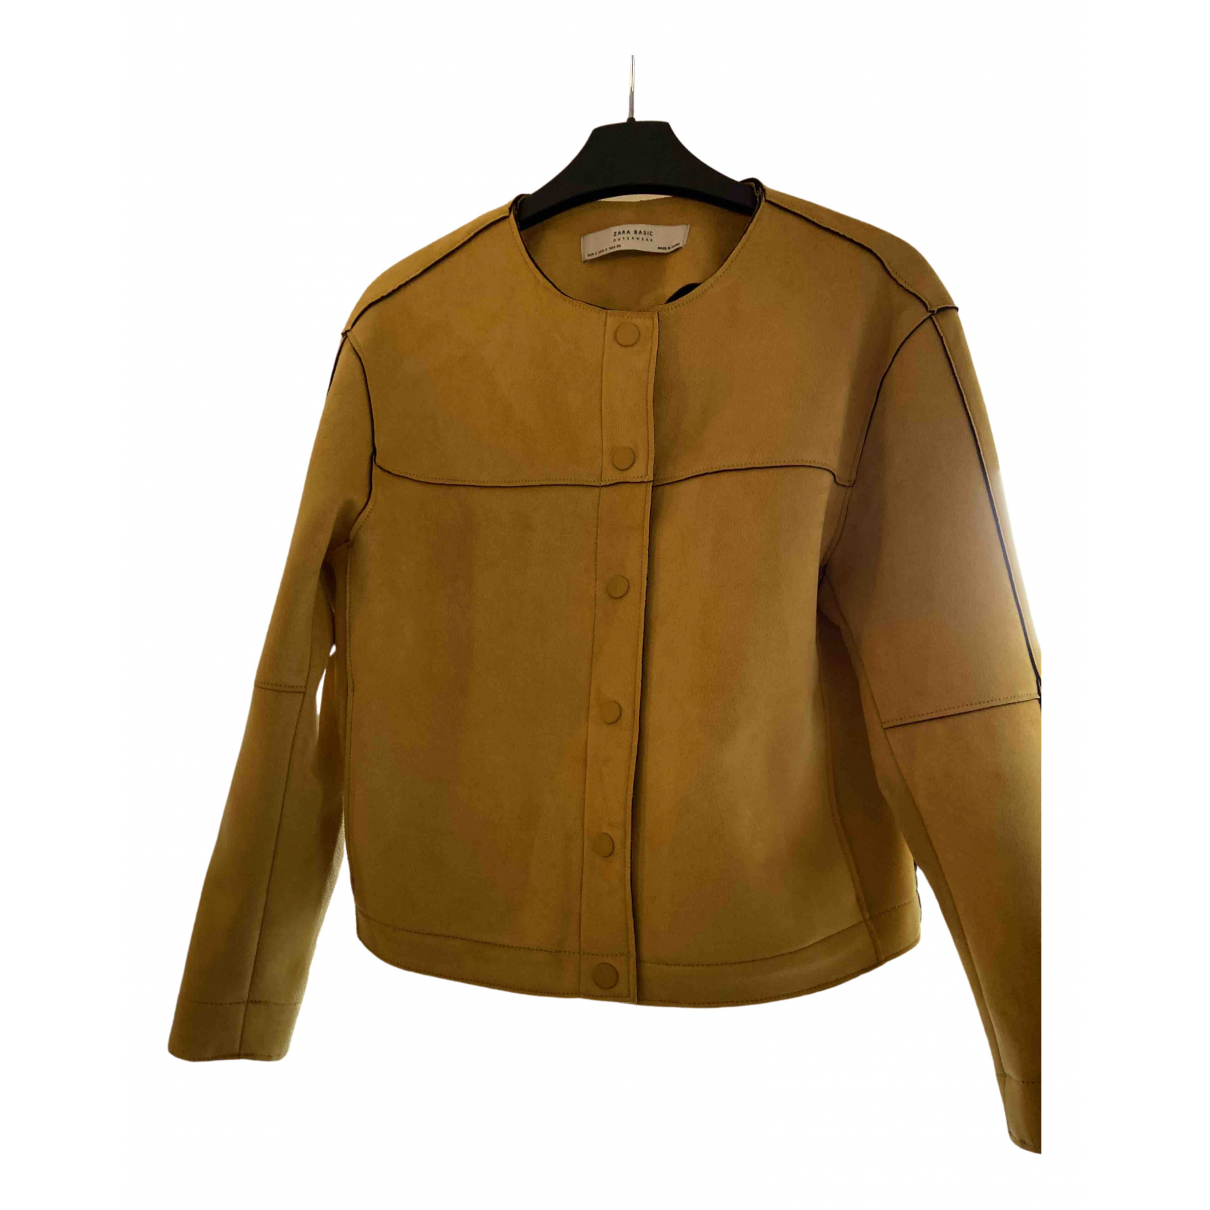 Zara - Veste   pour femme - jaune